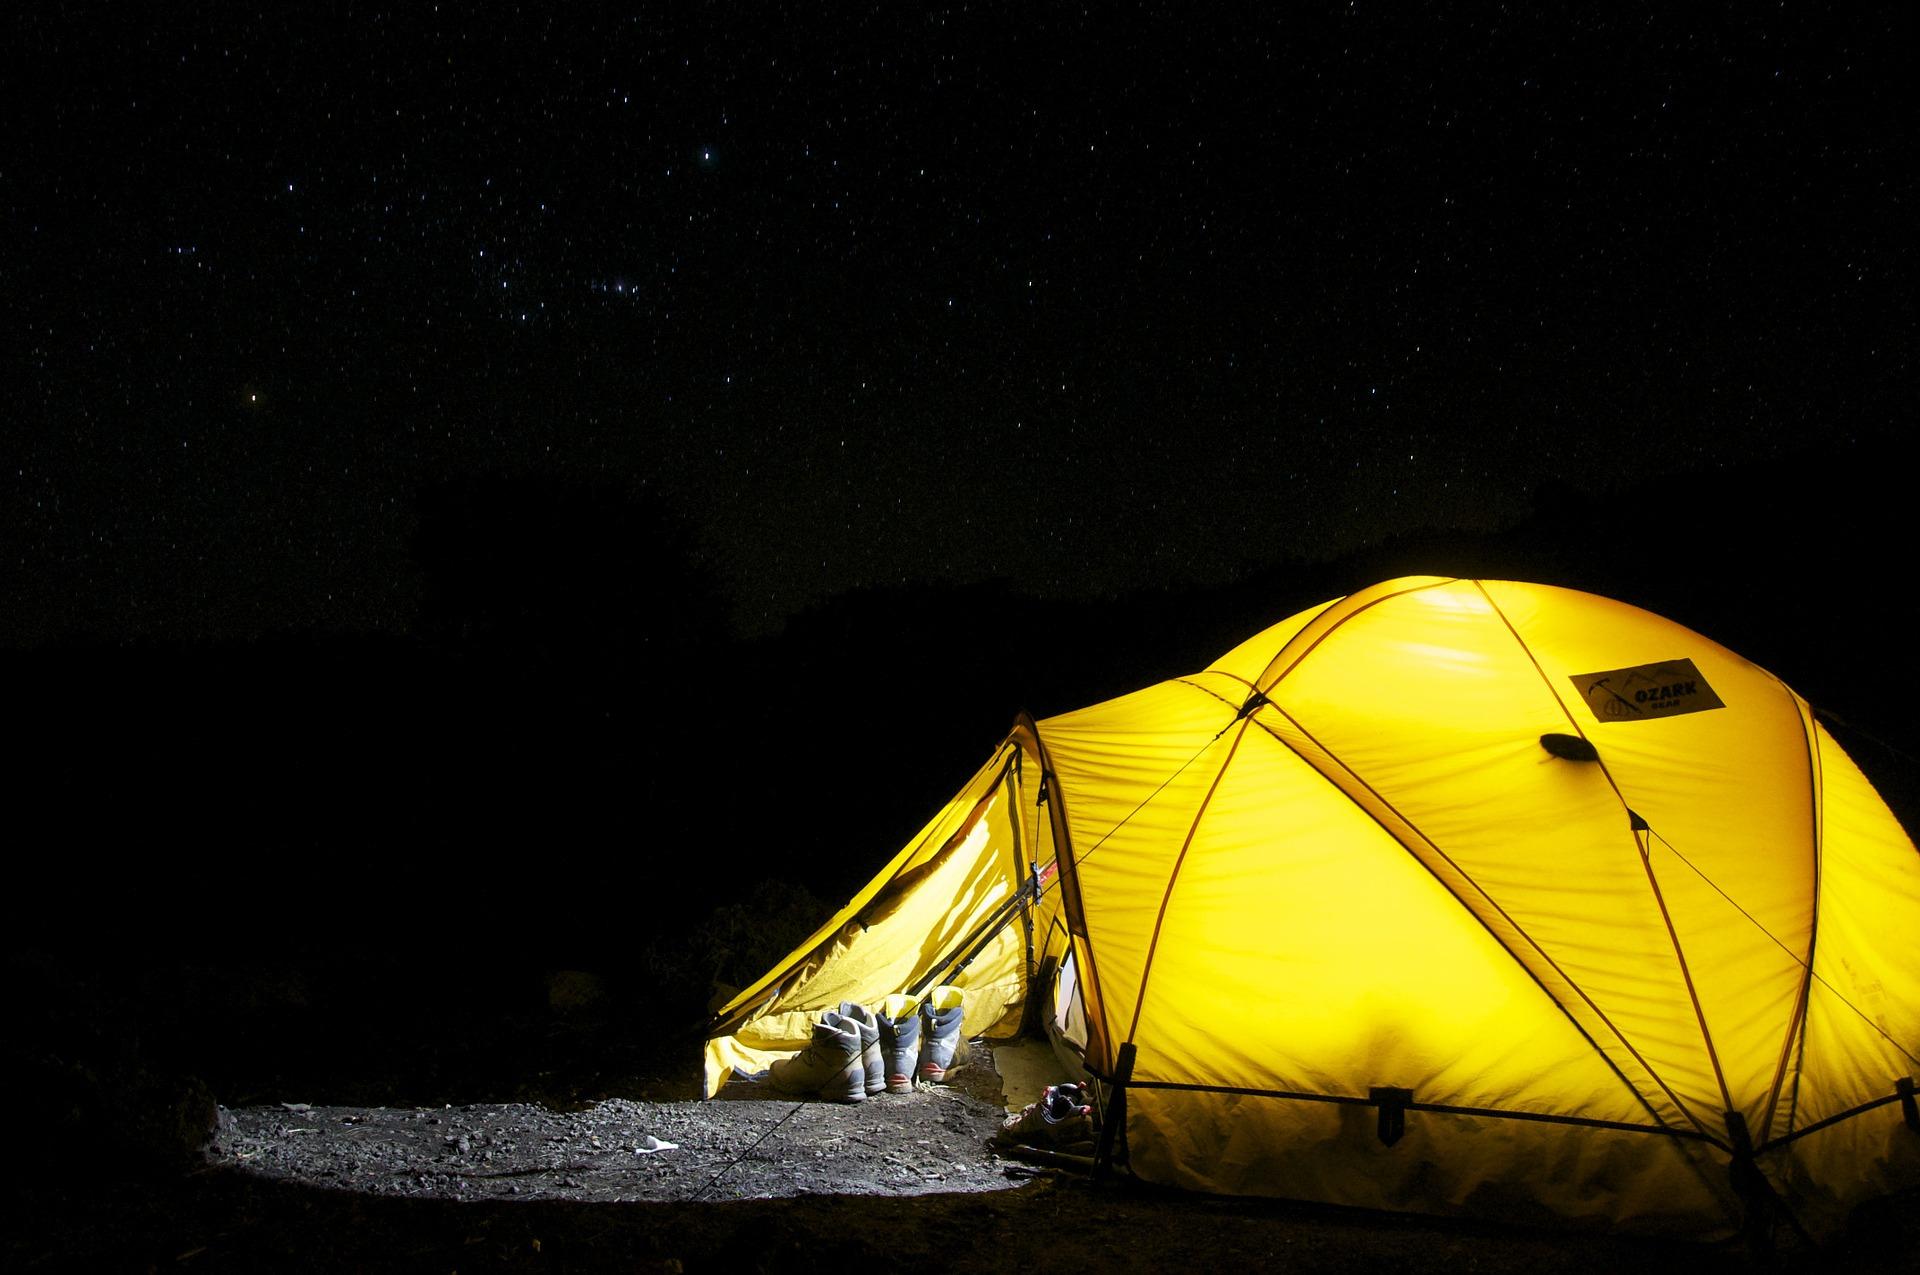 ve-25-tent-548022_1920